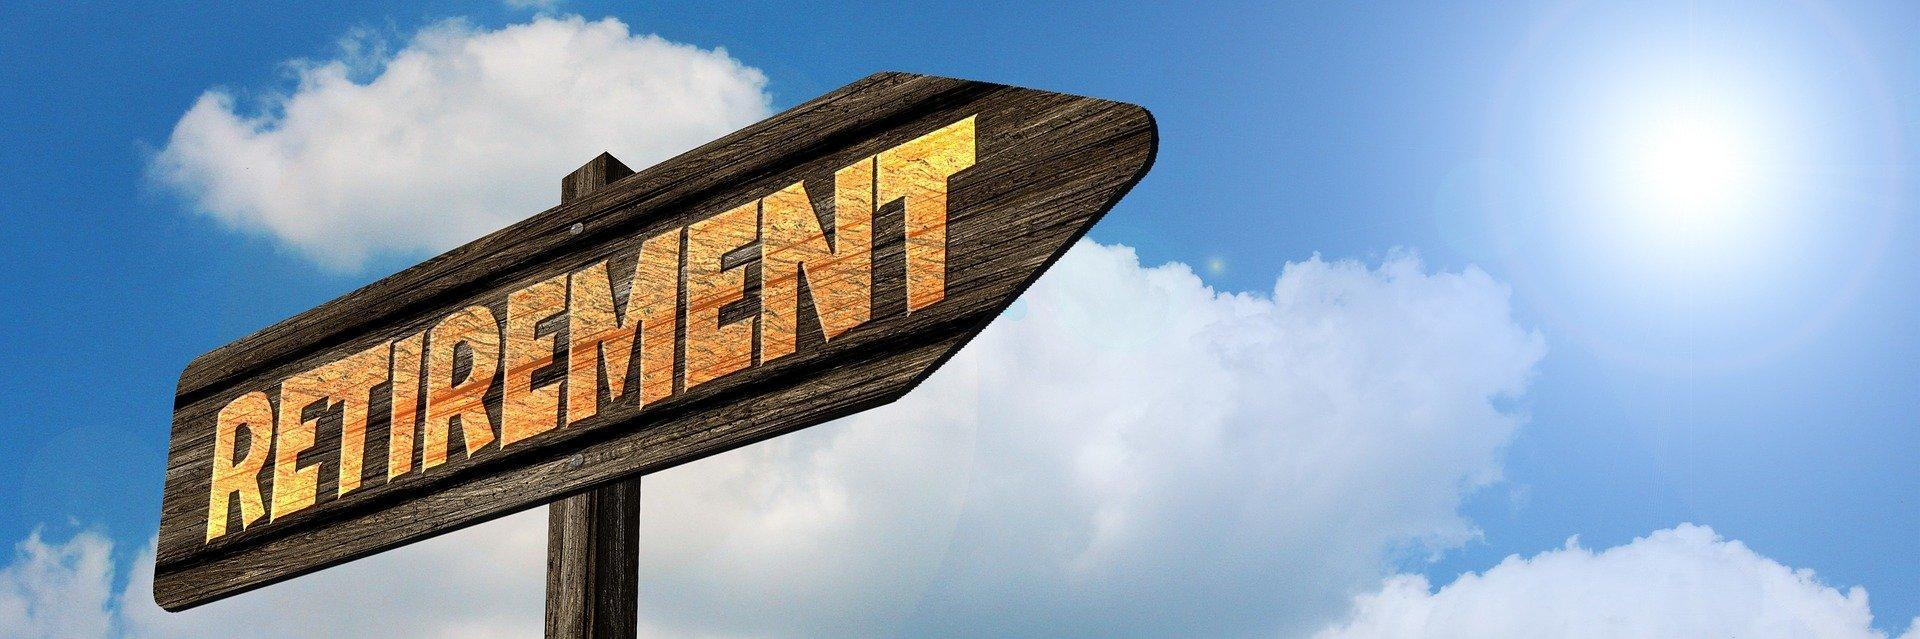 Should Retirement Be Hard Work? Thumbnail